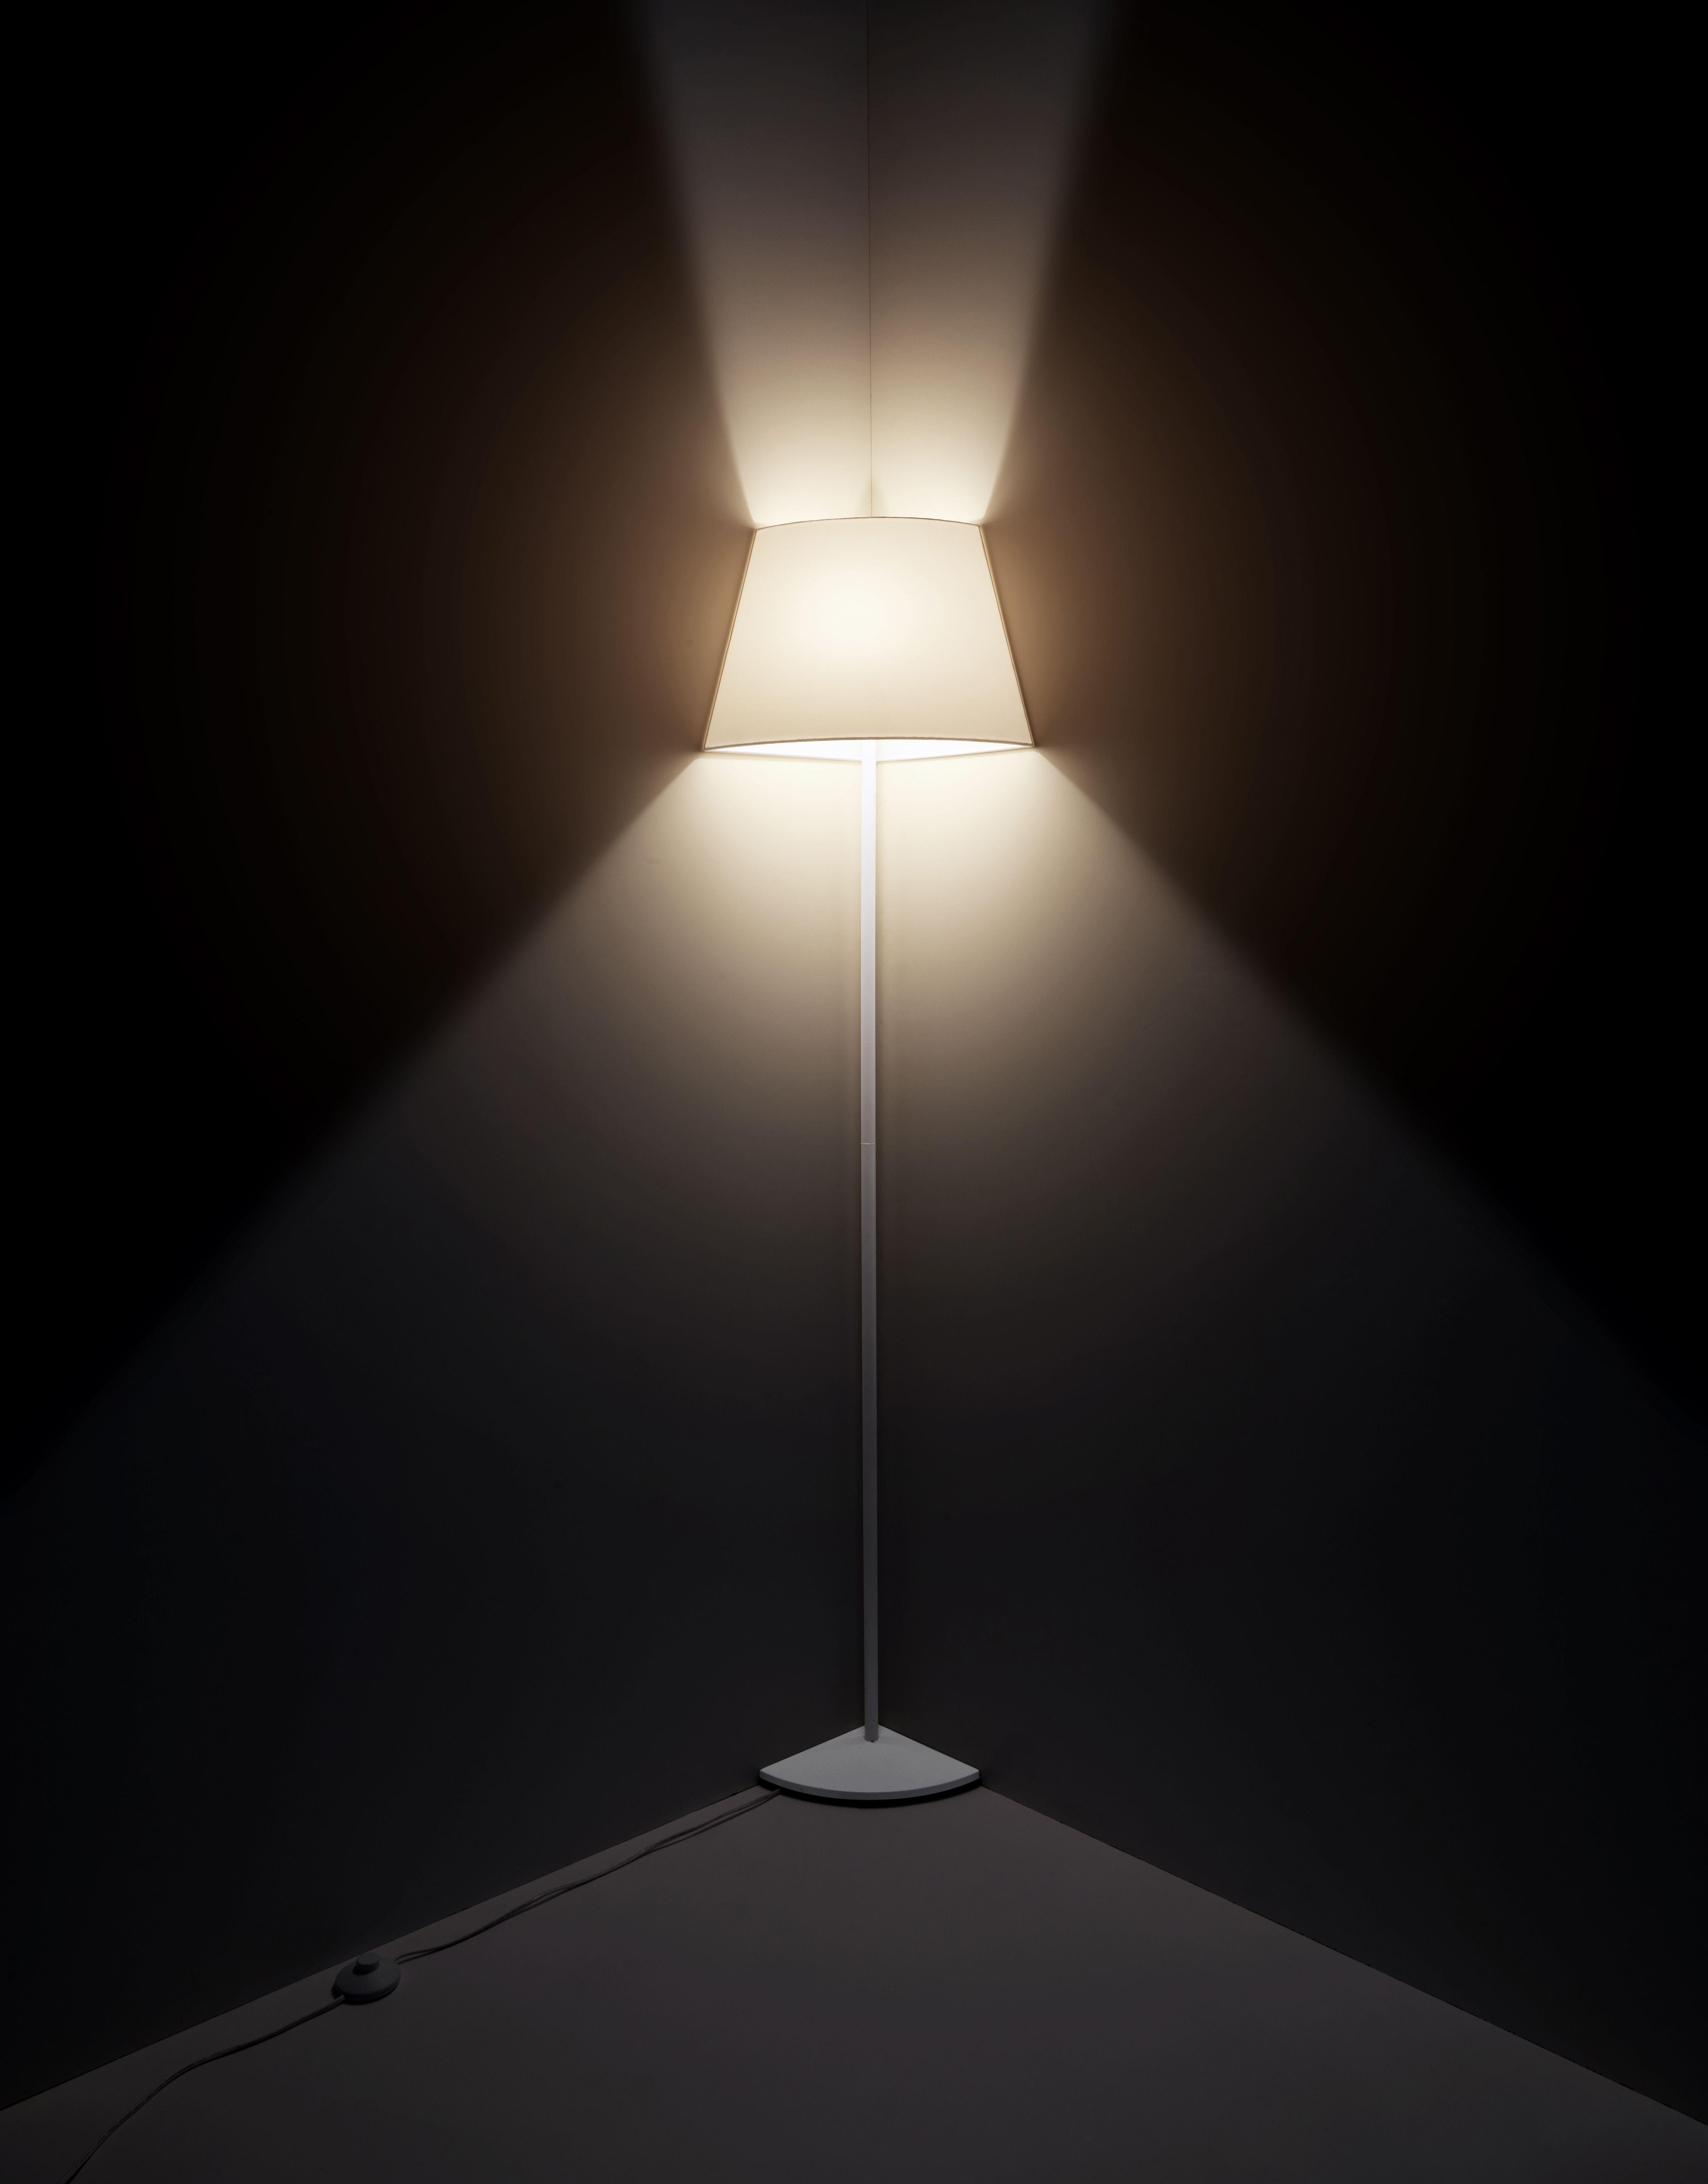 CORNER LAMP BY ROBERTO CÁRDENAS